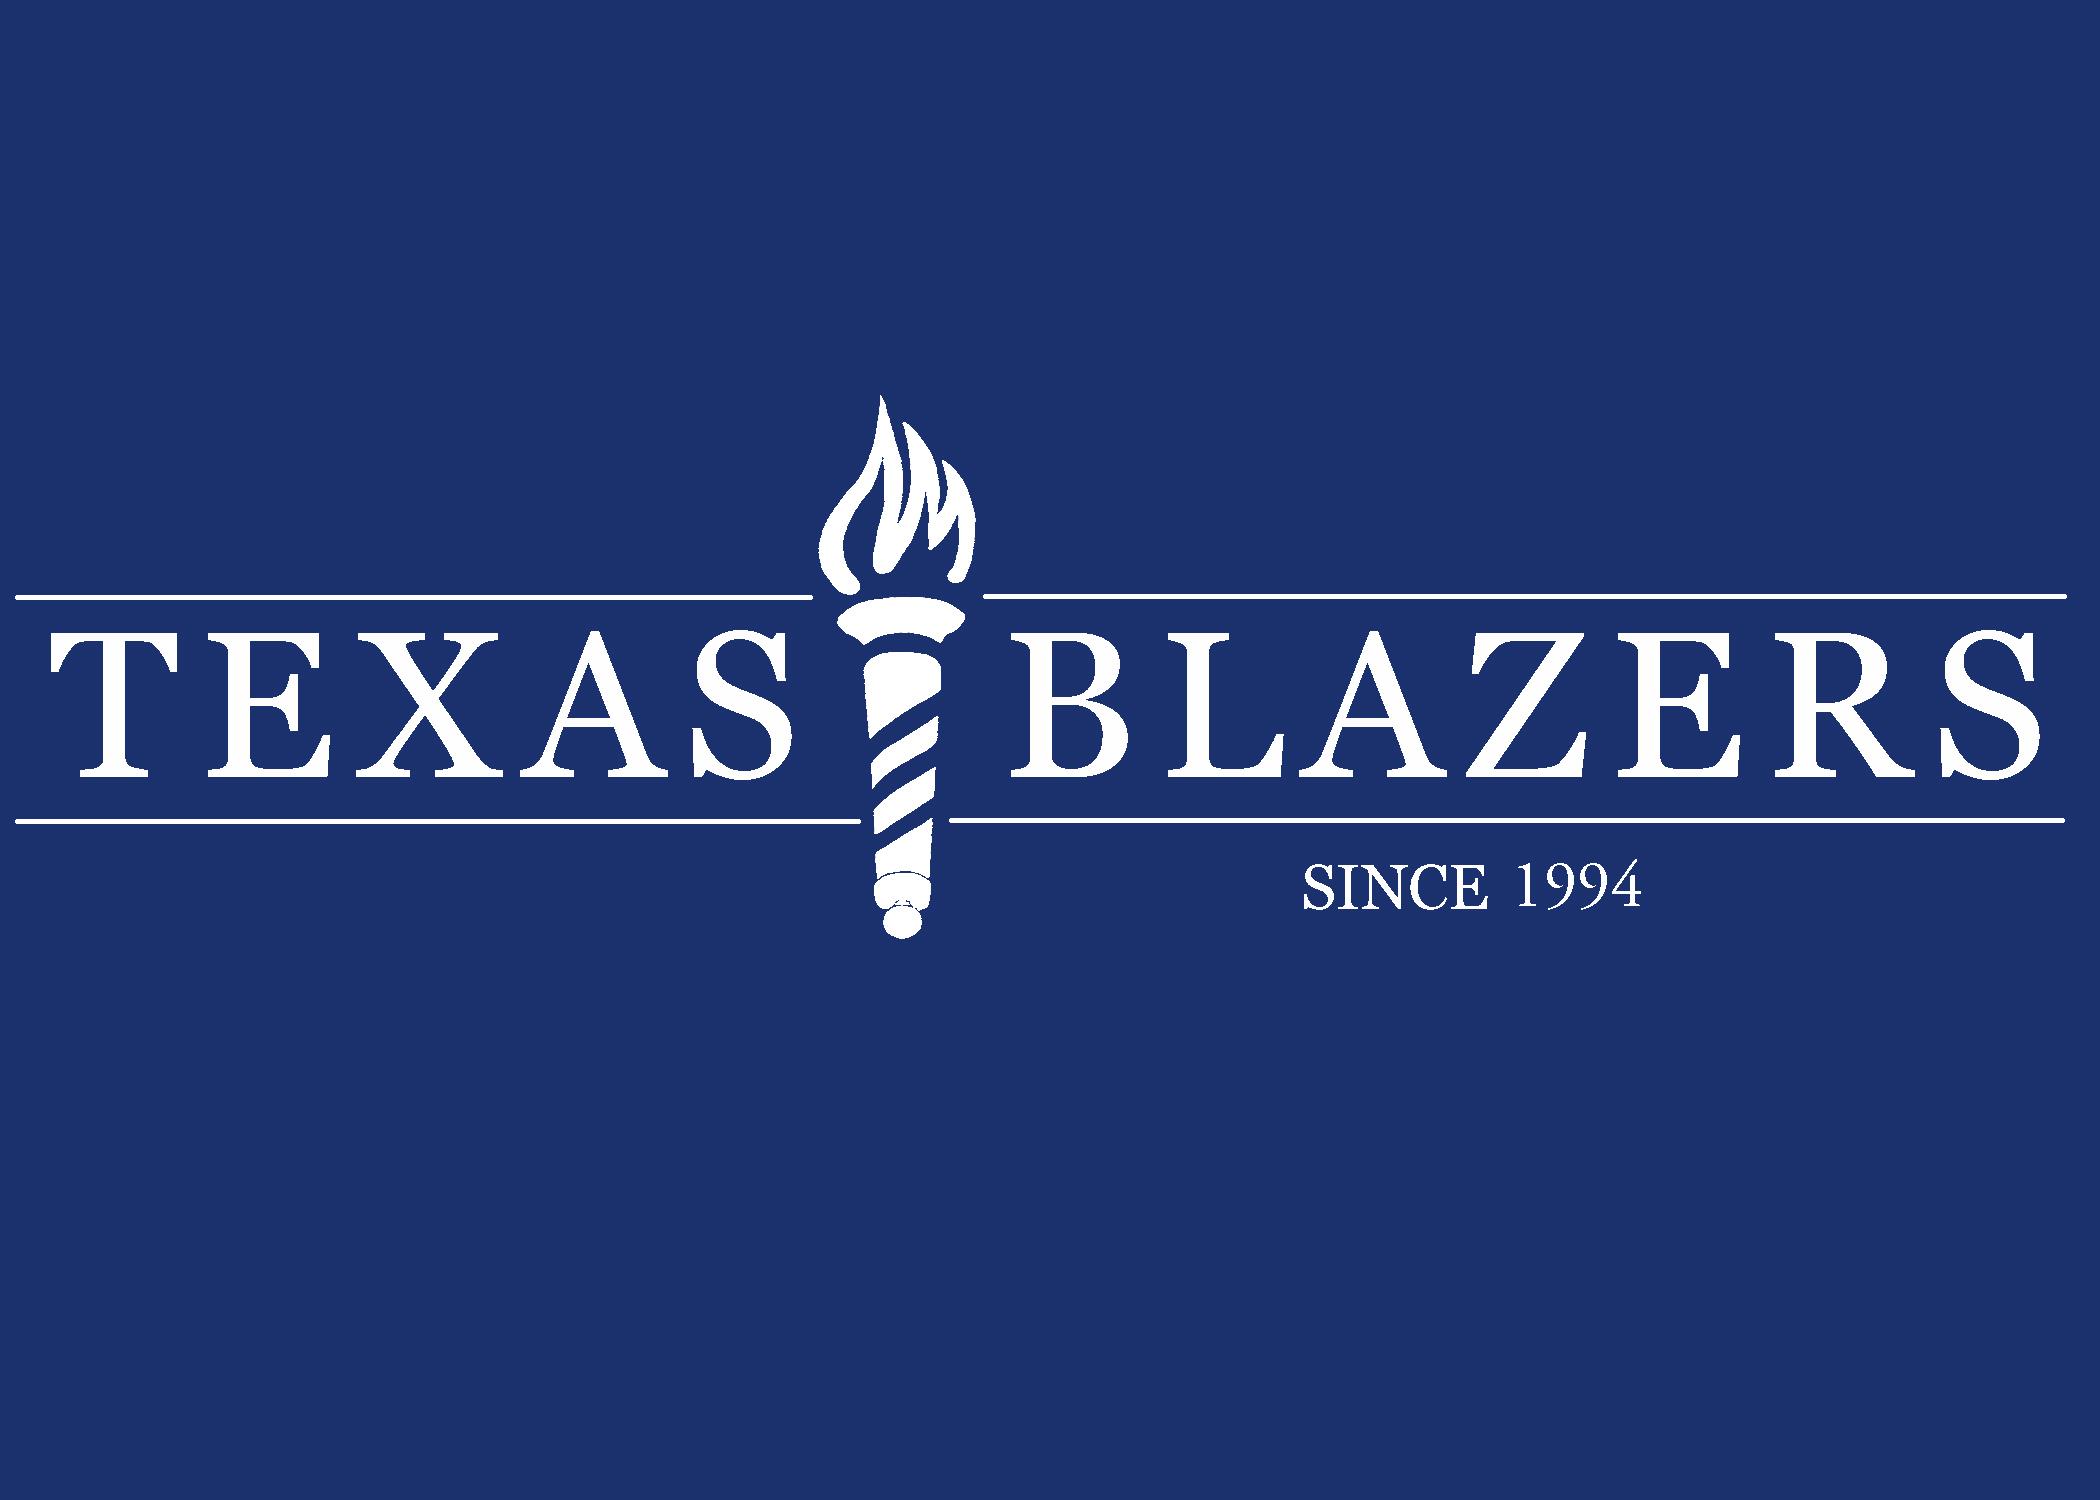 Blazers_logo_on_navy.jpg